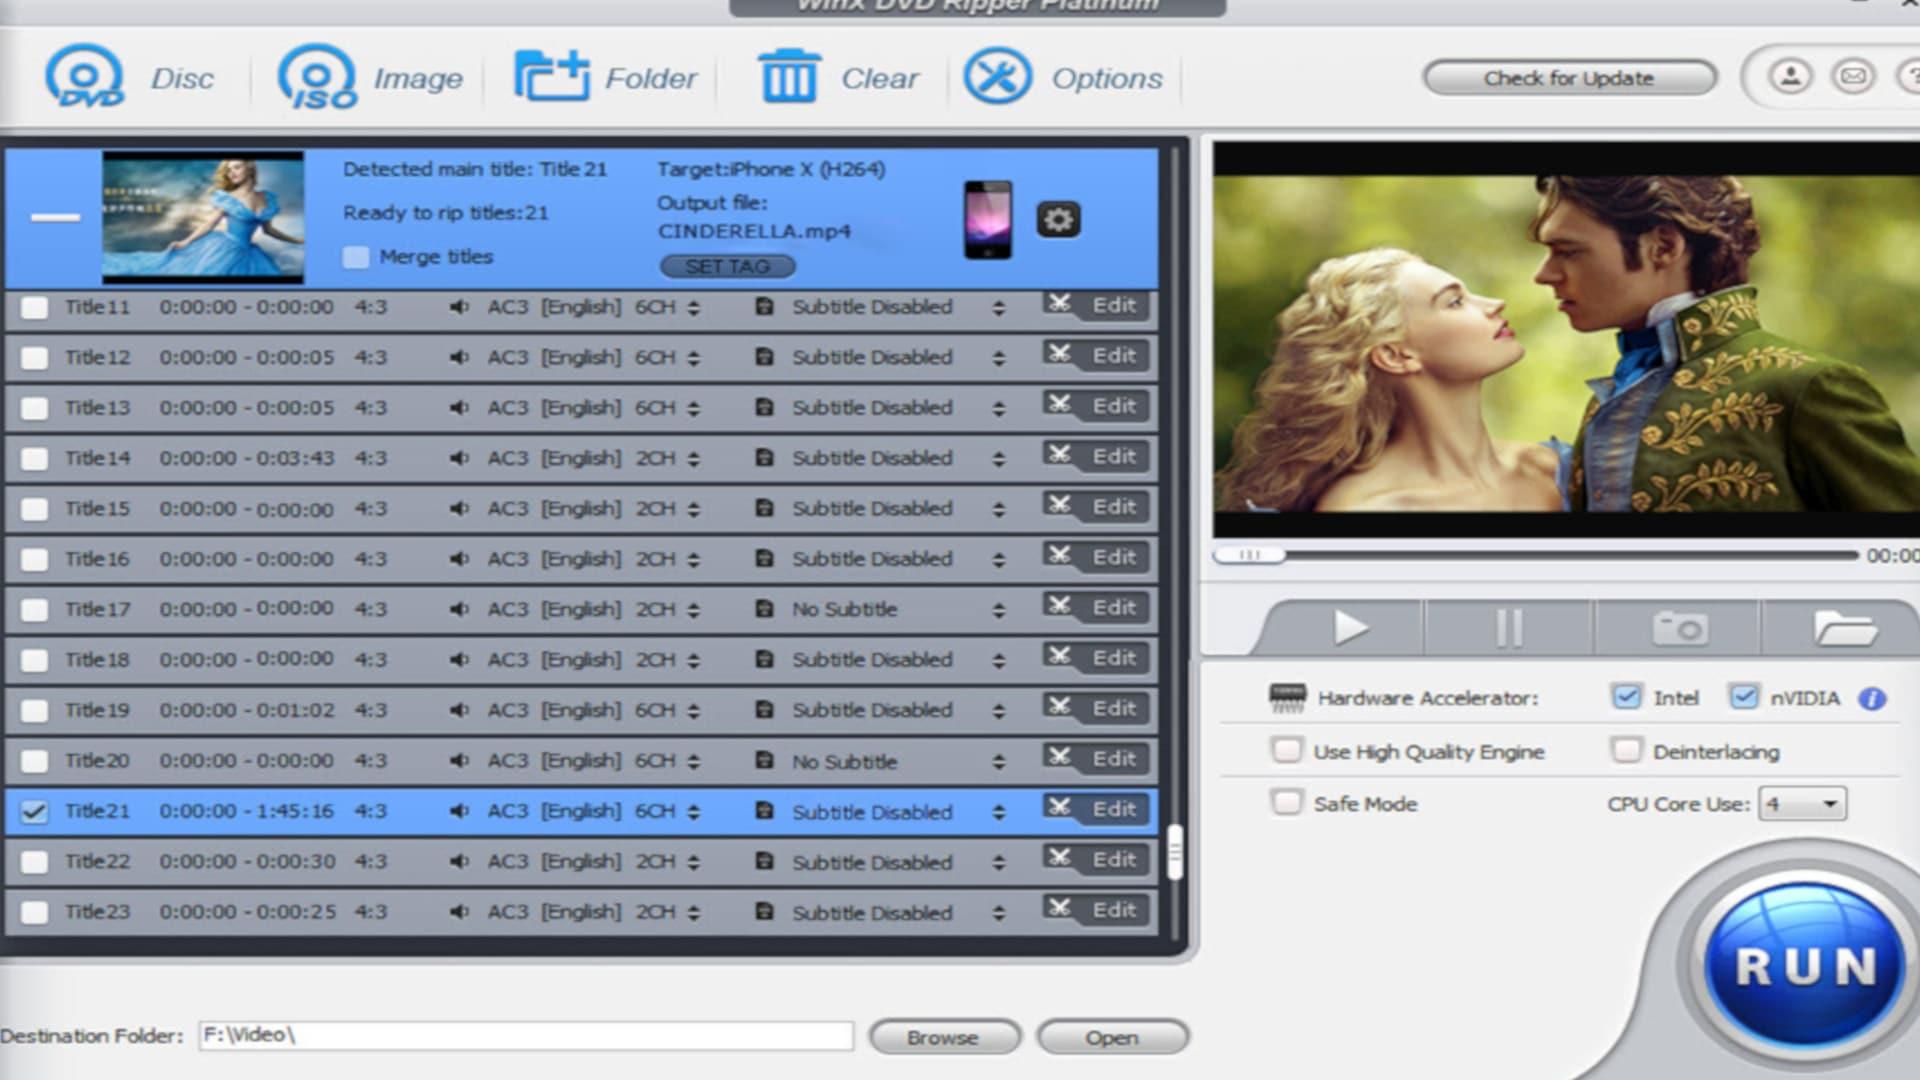 WinX DVD Ripper Platinum Torrent Archives